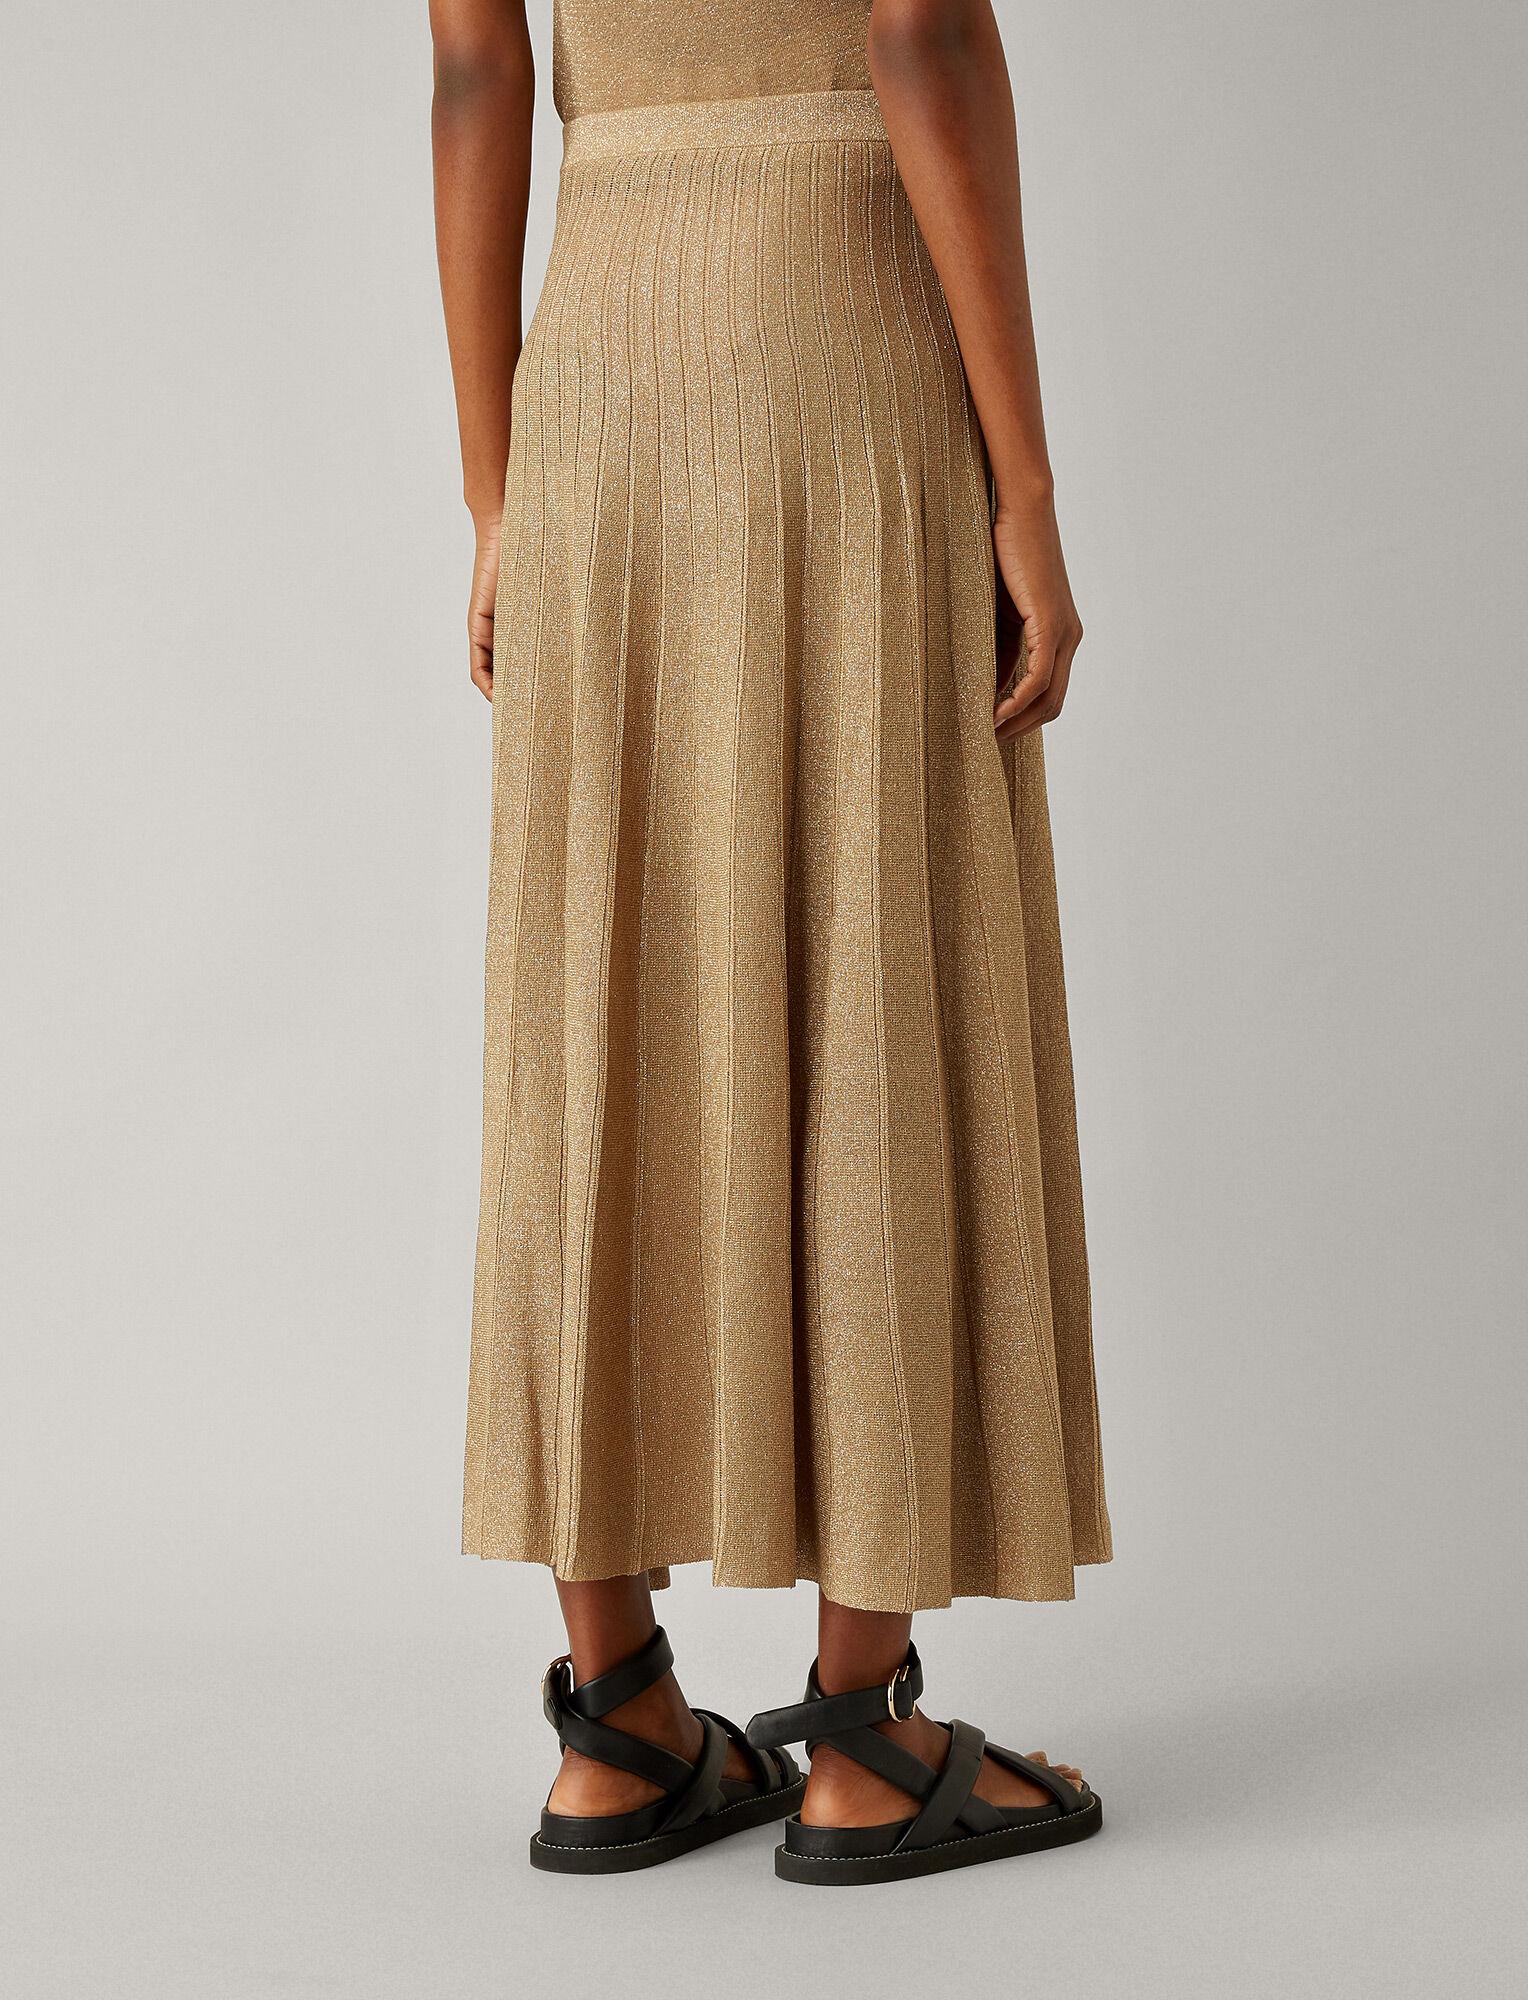 Joseph, Lurex Skirt, in TAN